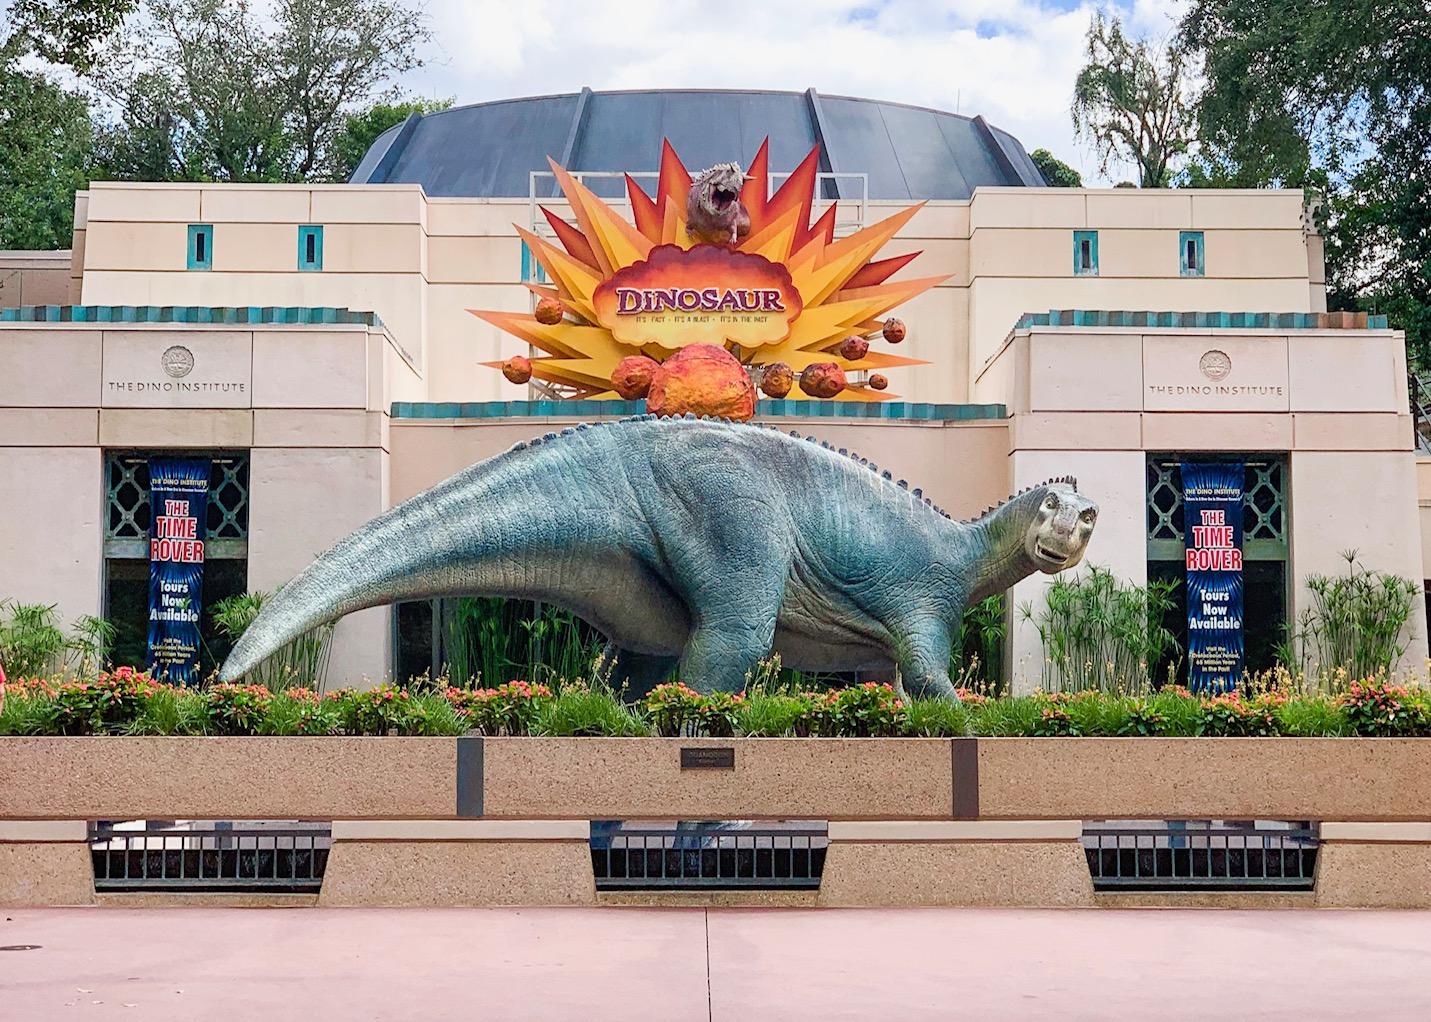 Entrance to Dinosaur ride at Disney's Animal Kingdom